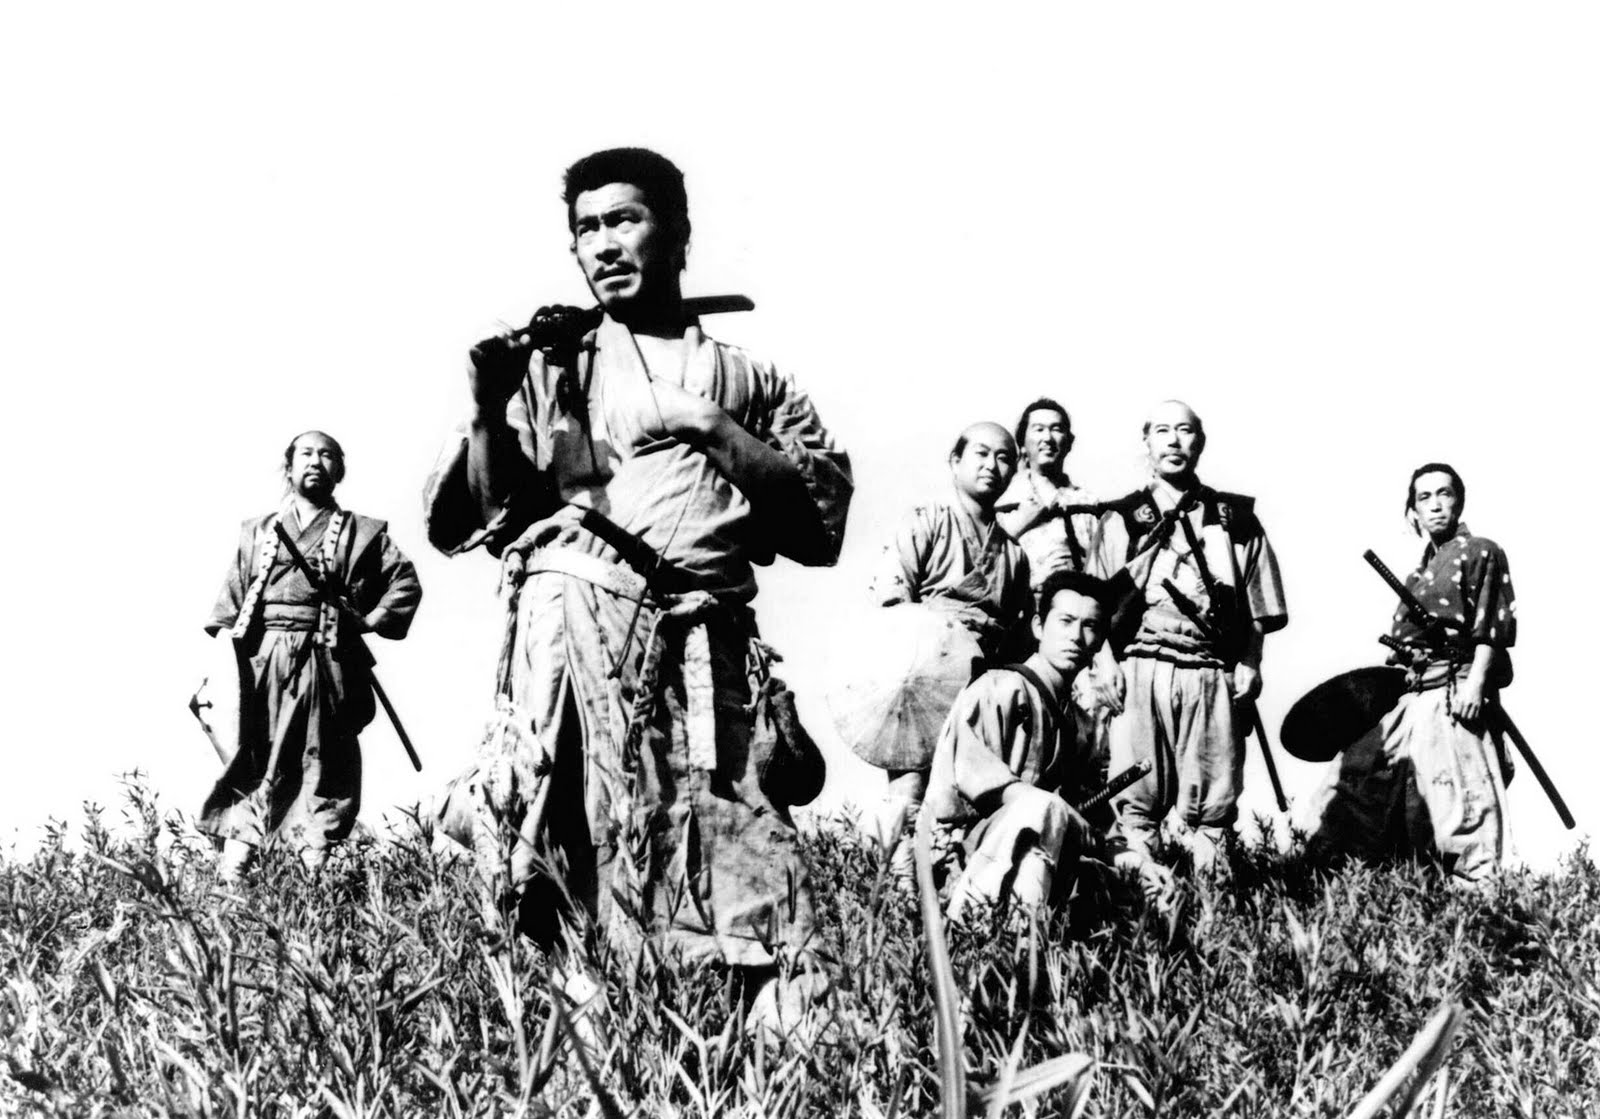 No tiene nada que ver con ciencia e historia, pero los siete samuráis molan. ¿Que no?